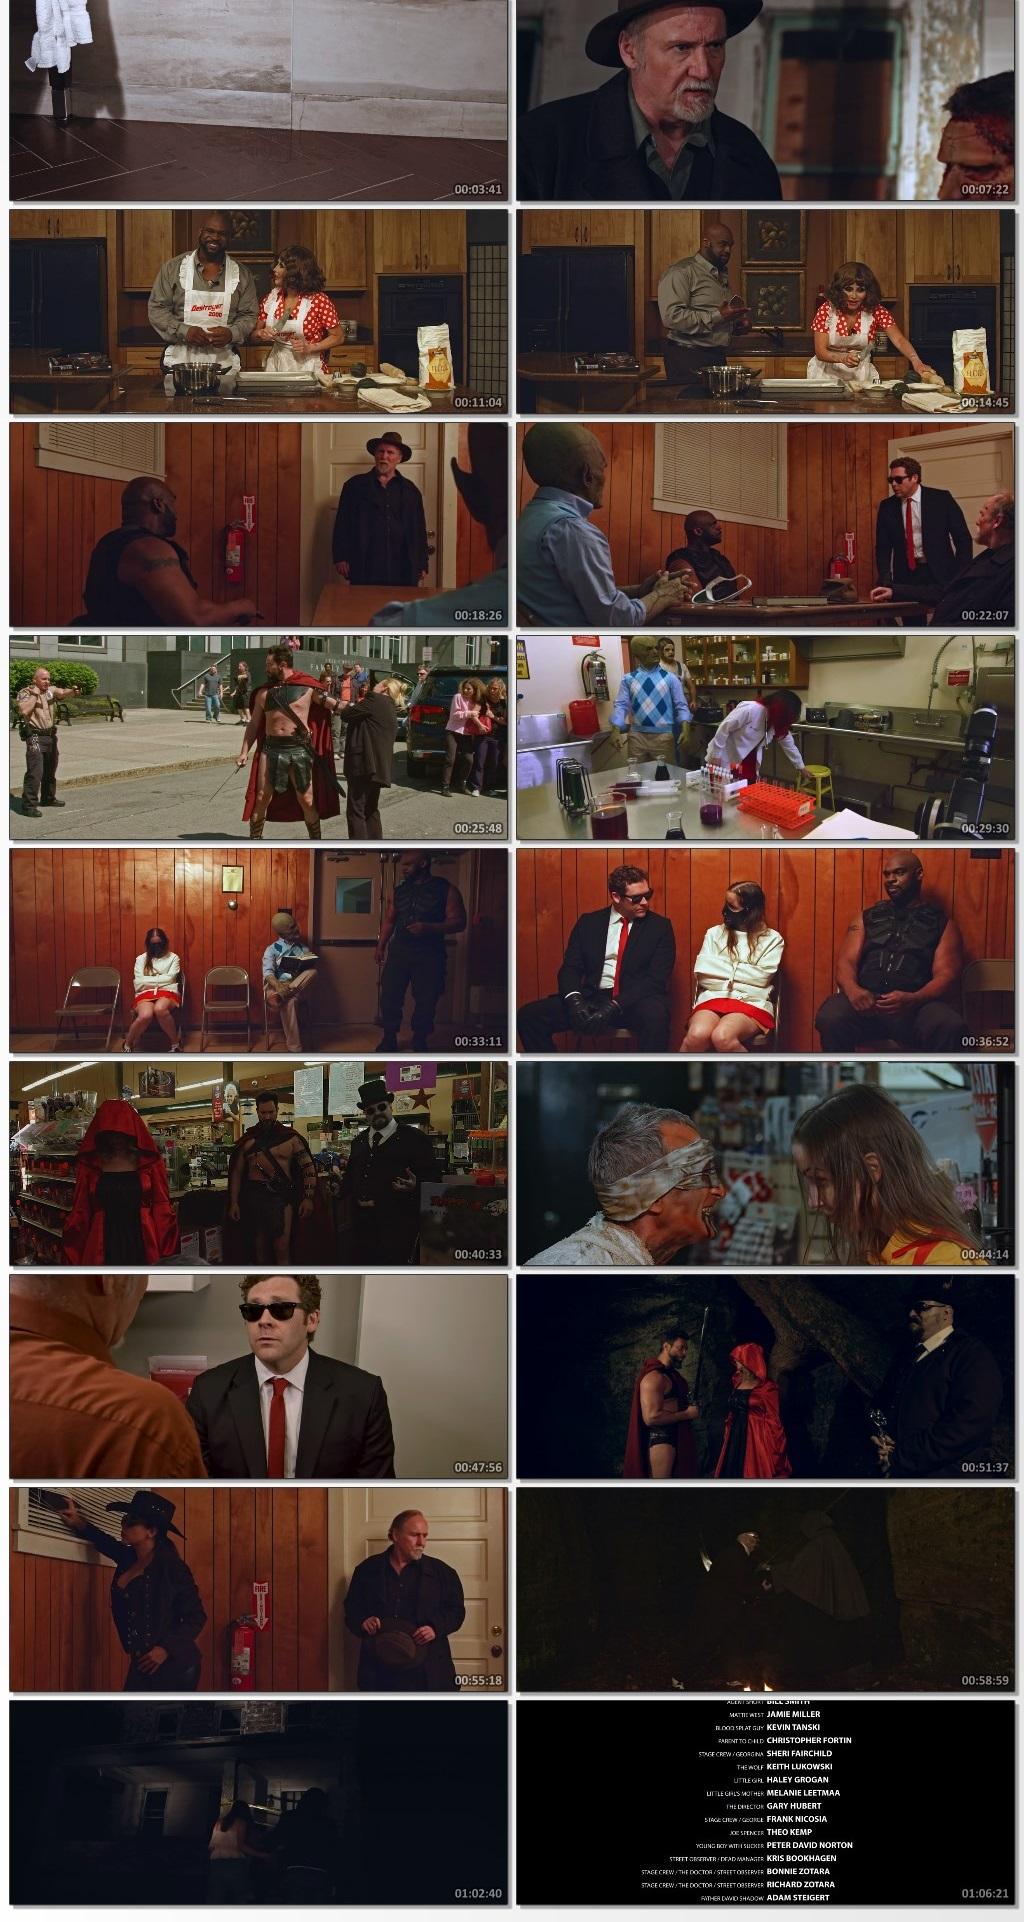 The-Horrific-Evil-Monsters-2021-720p-WEBRip-x264-www-7-Star-HD-Cards-mp4-thumbs